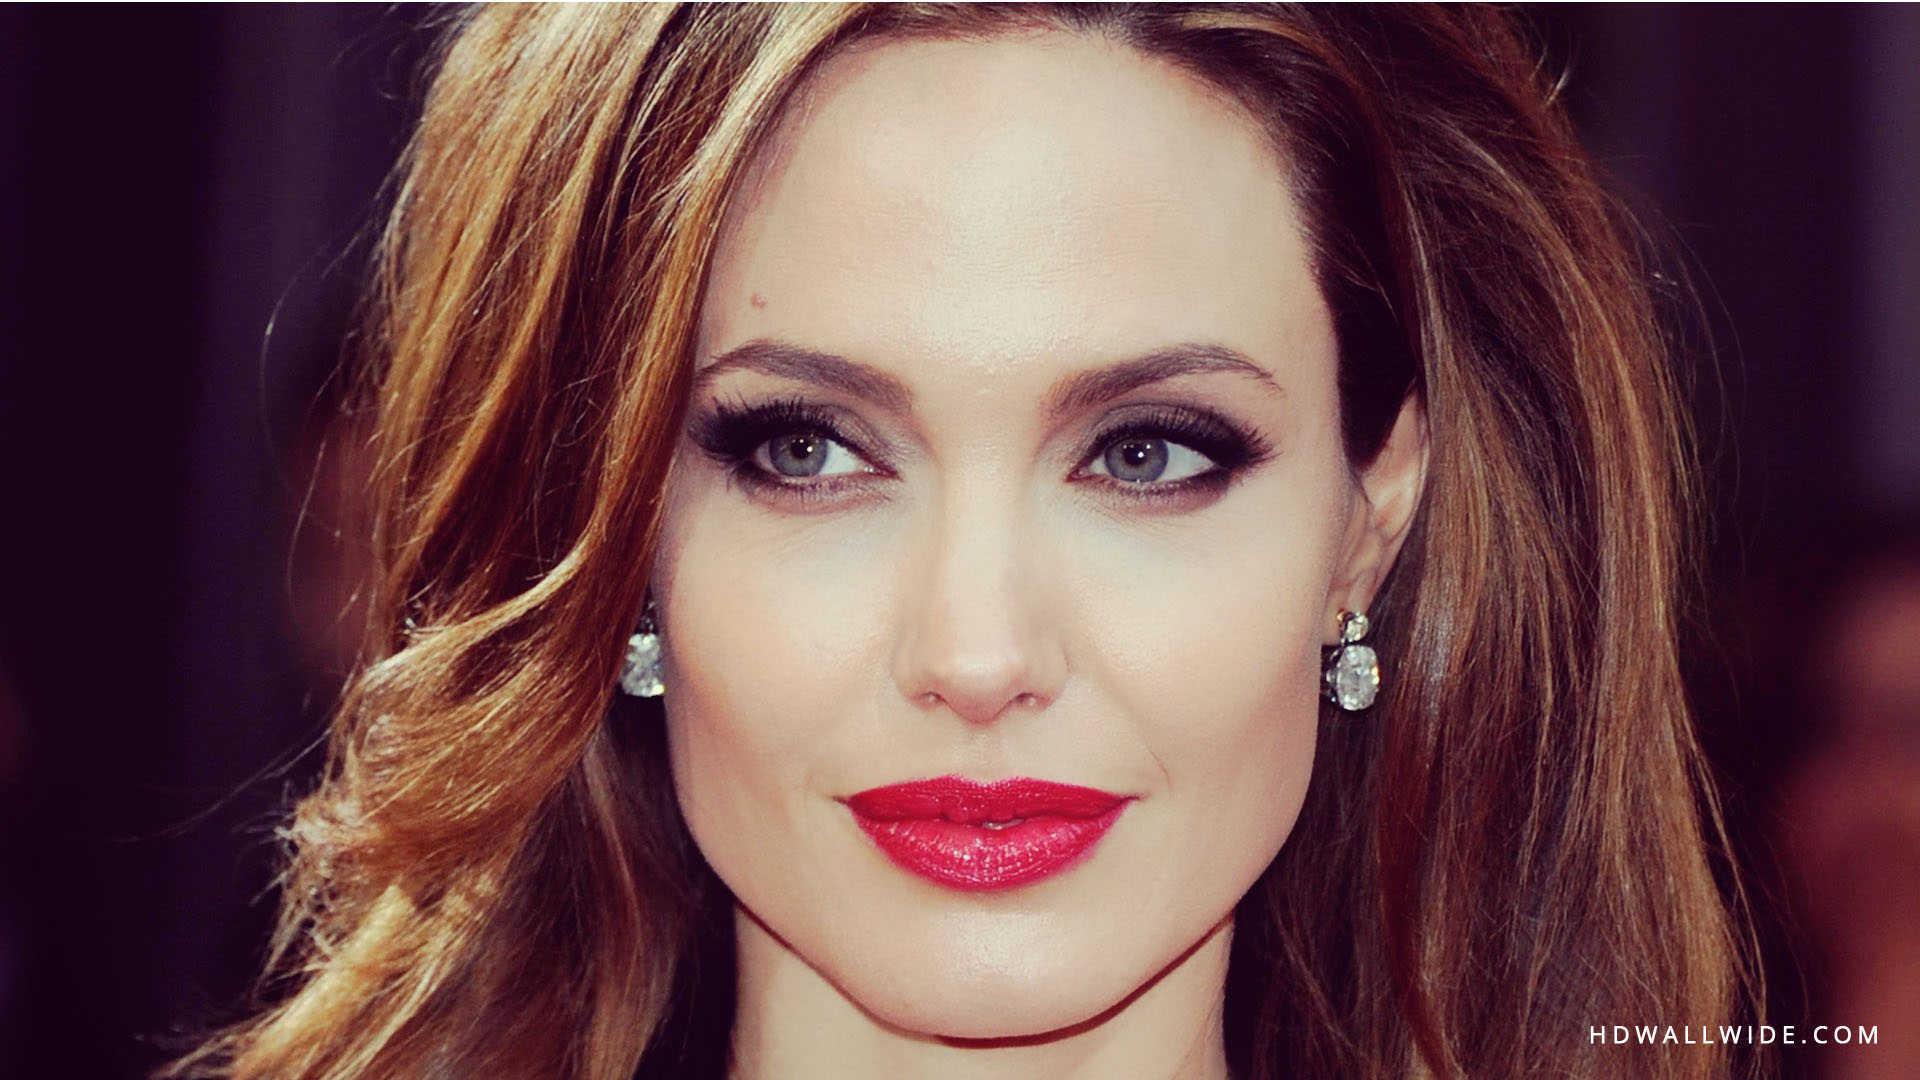 Download Angelina Jolie Red Lips Hd Wallpaper Hdwallwide 1920x1080px